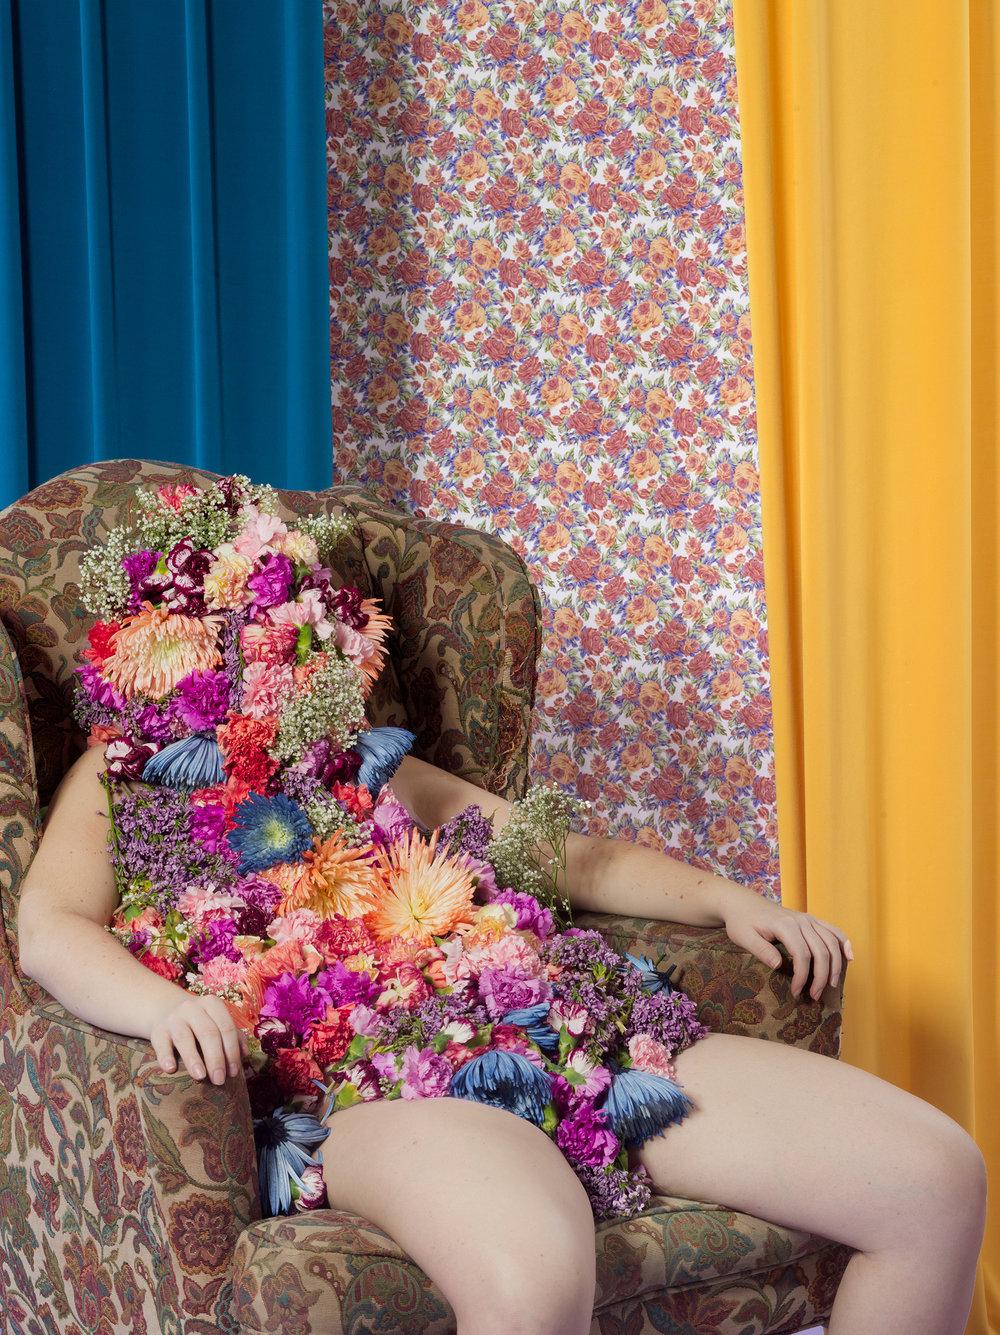 VdayBouquets_JessicaPettway_08.jpg